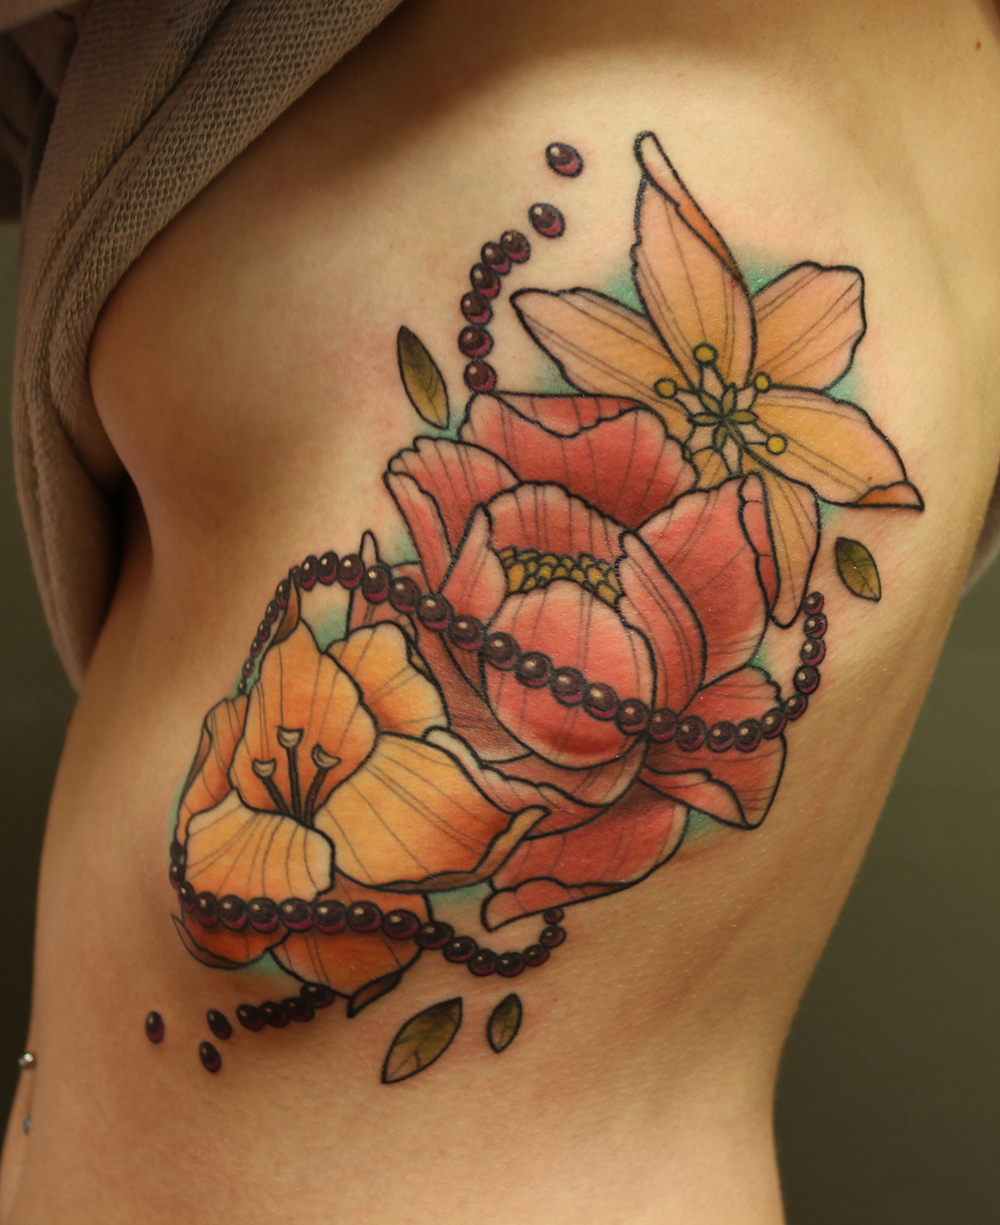 Dark Horse Tattoo Company in Gilbert, AZ